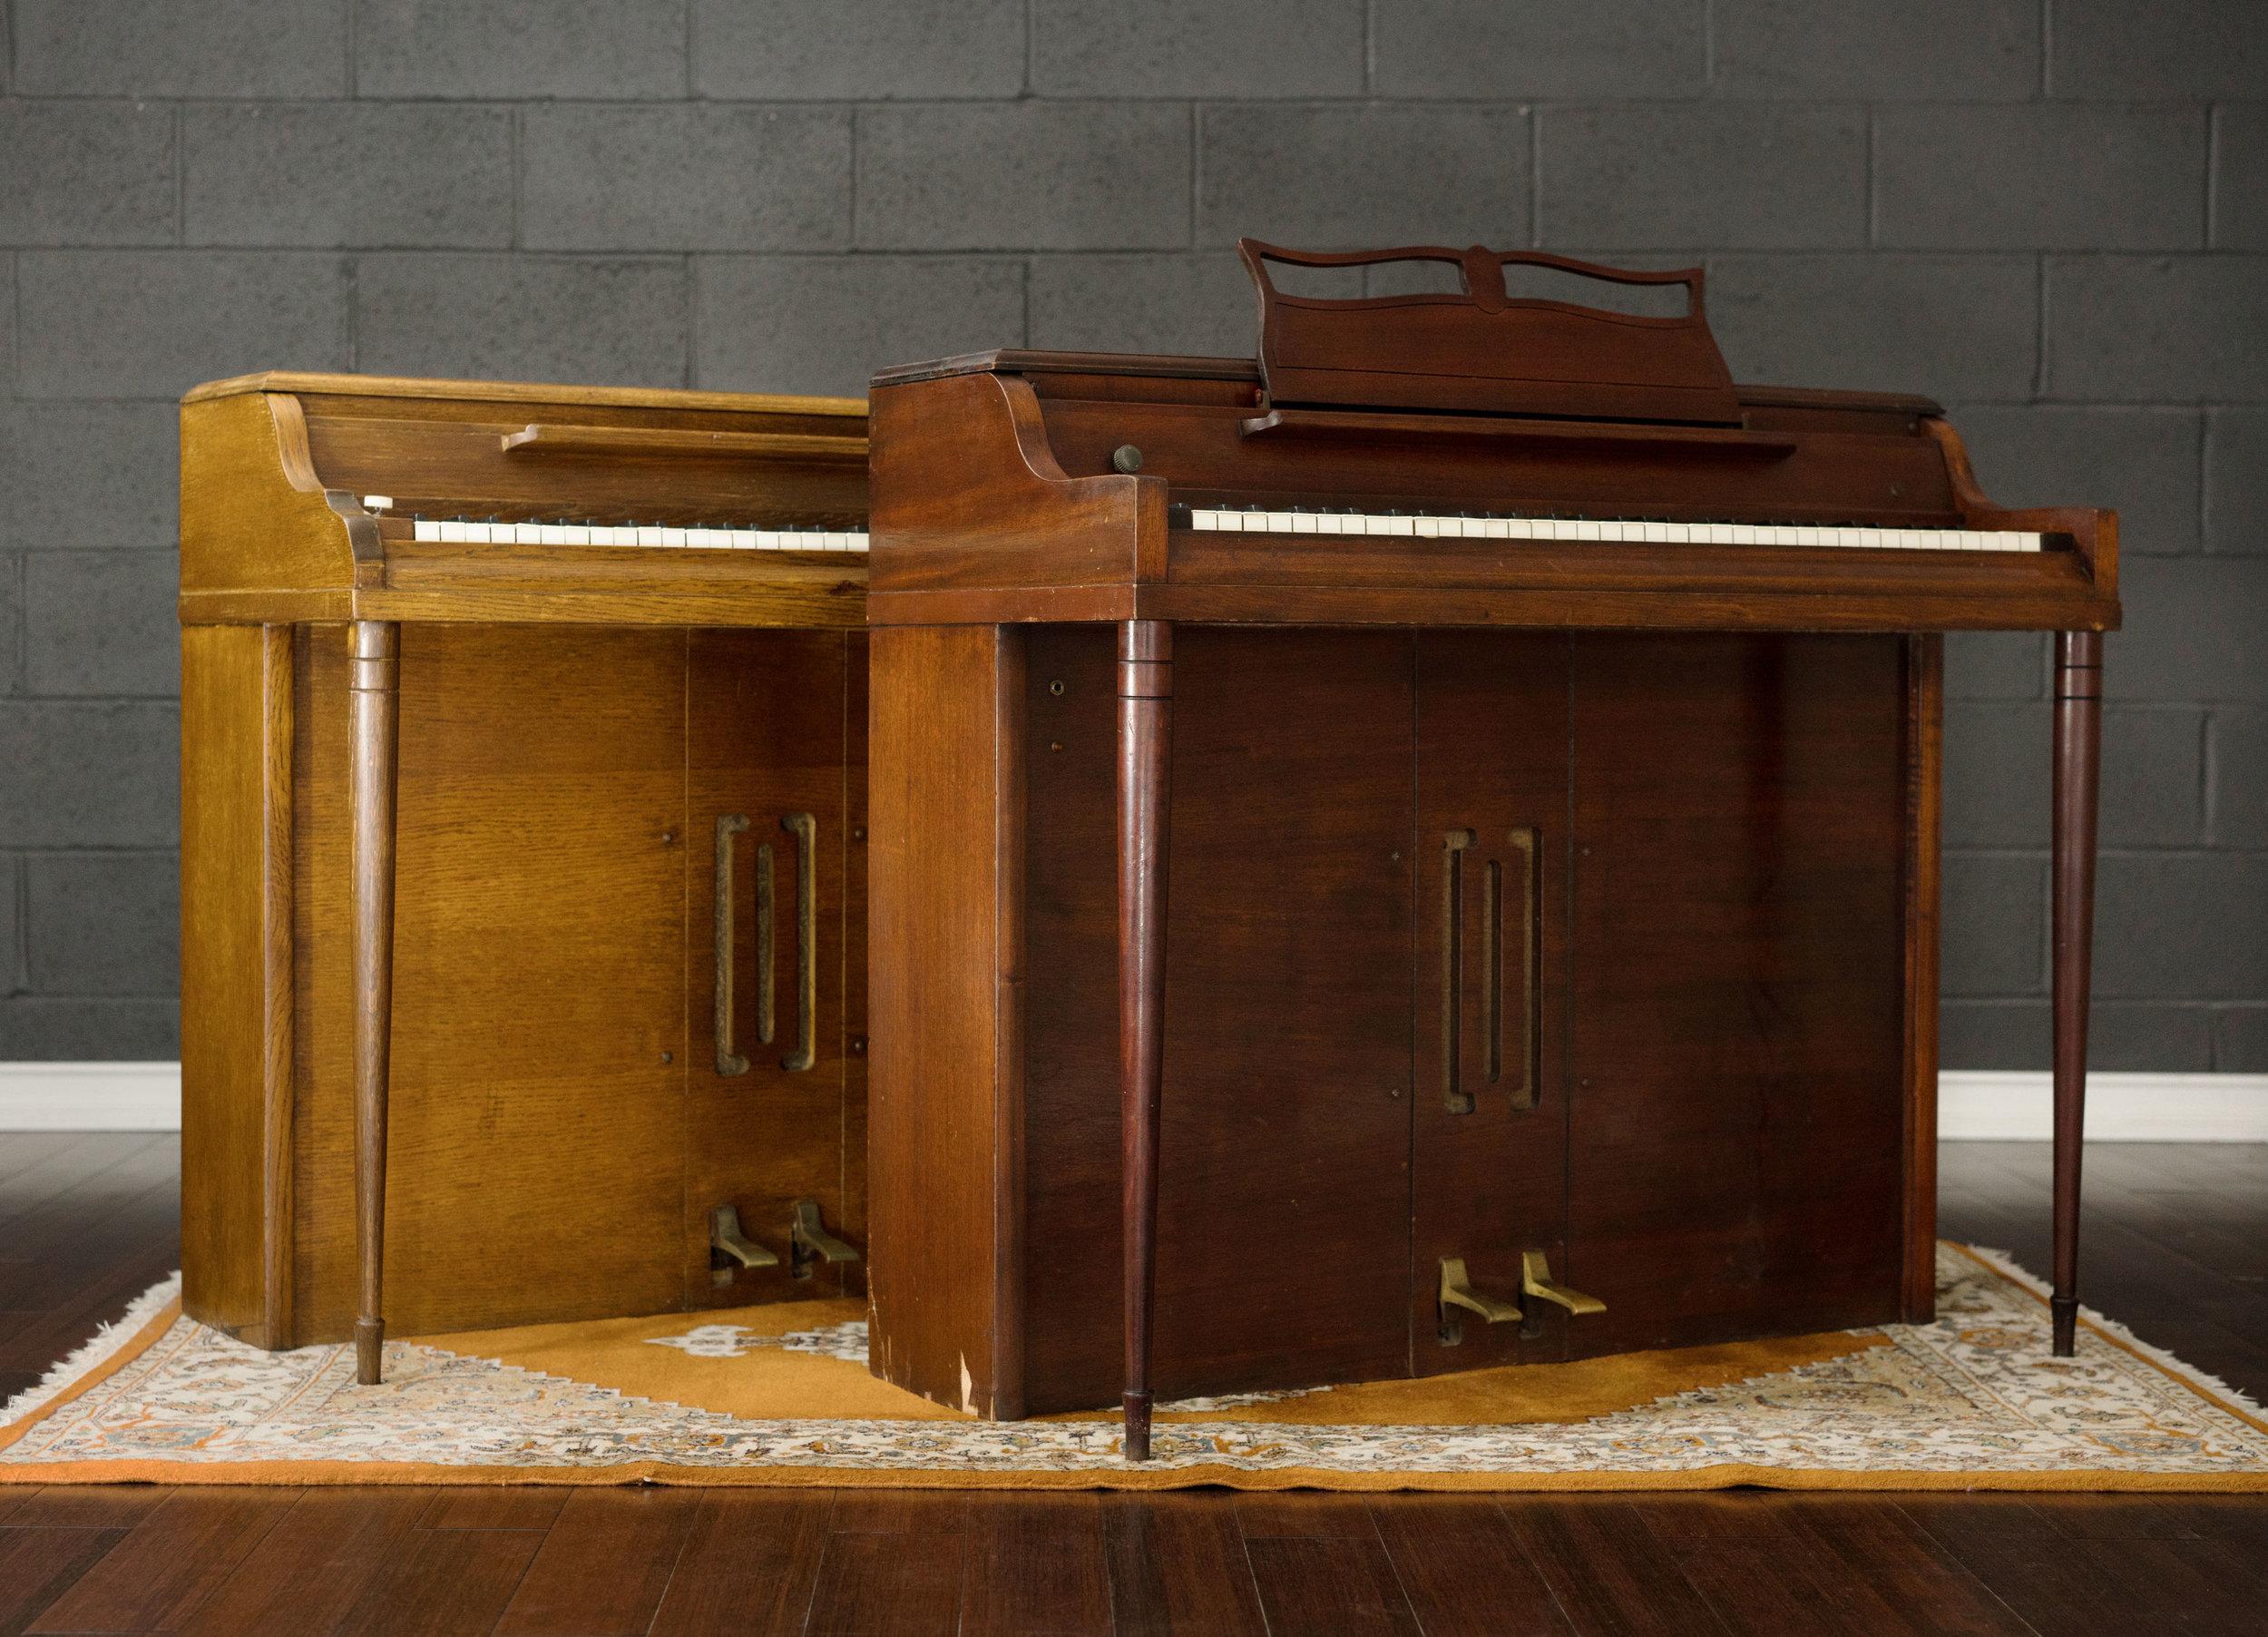 Wurlitzer-700-electronic-pianos.jpg